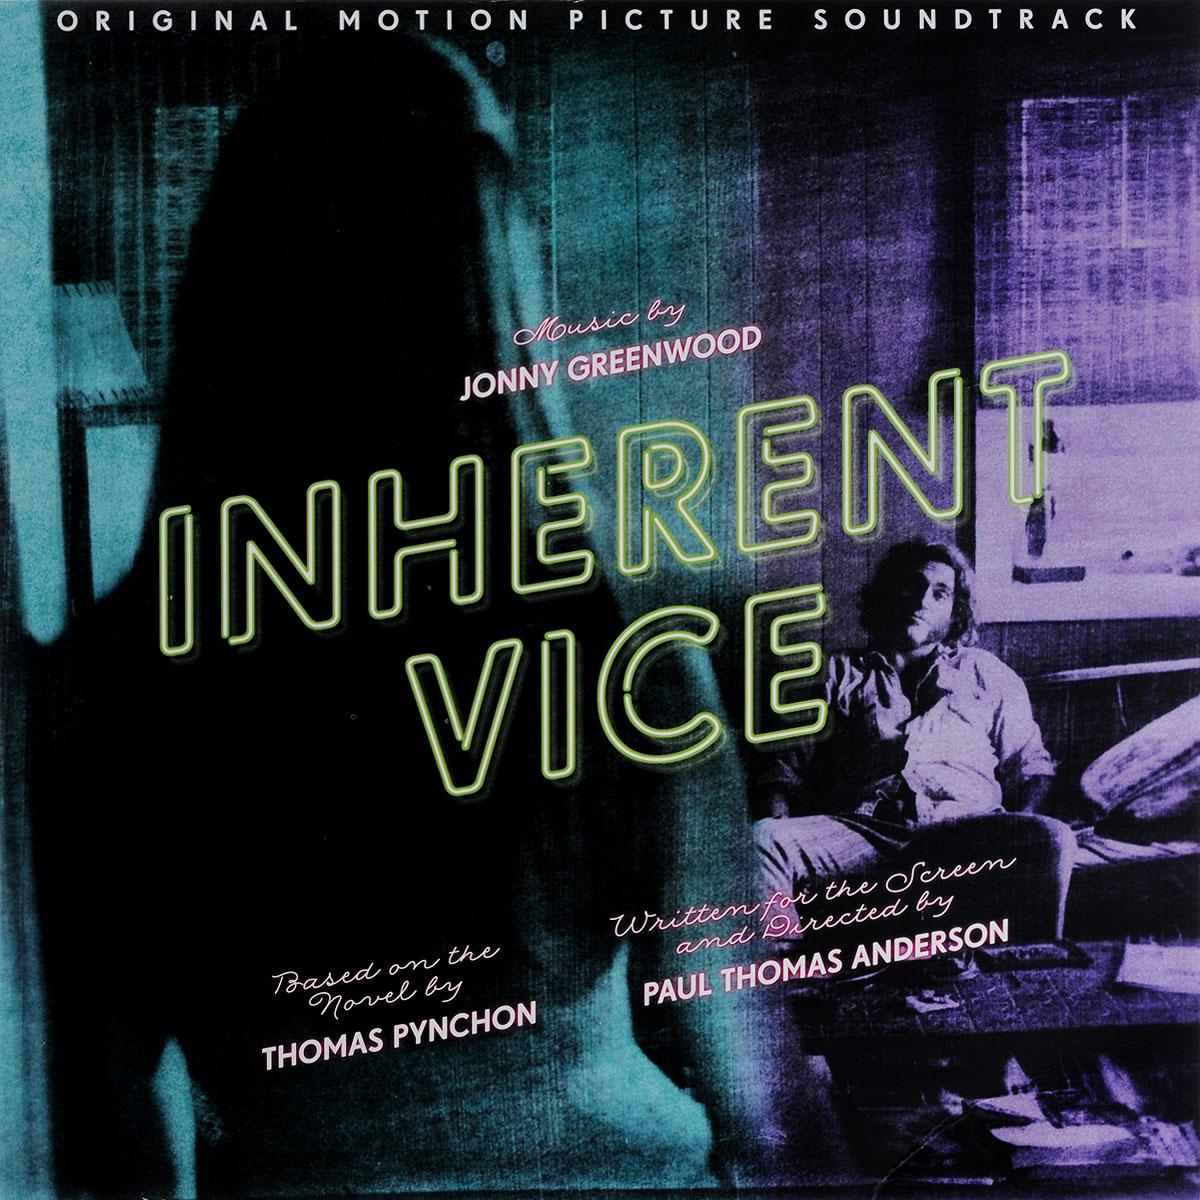 лучшая цена Jonny Greenwood. Inherent Vice. Original Motion Picture Soundtrack (2 LP)